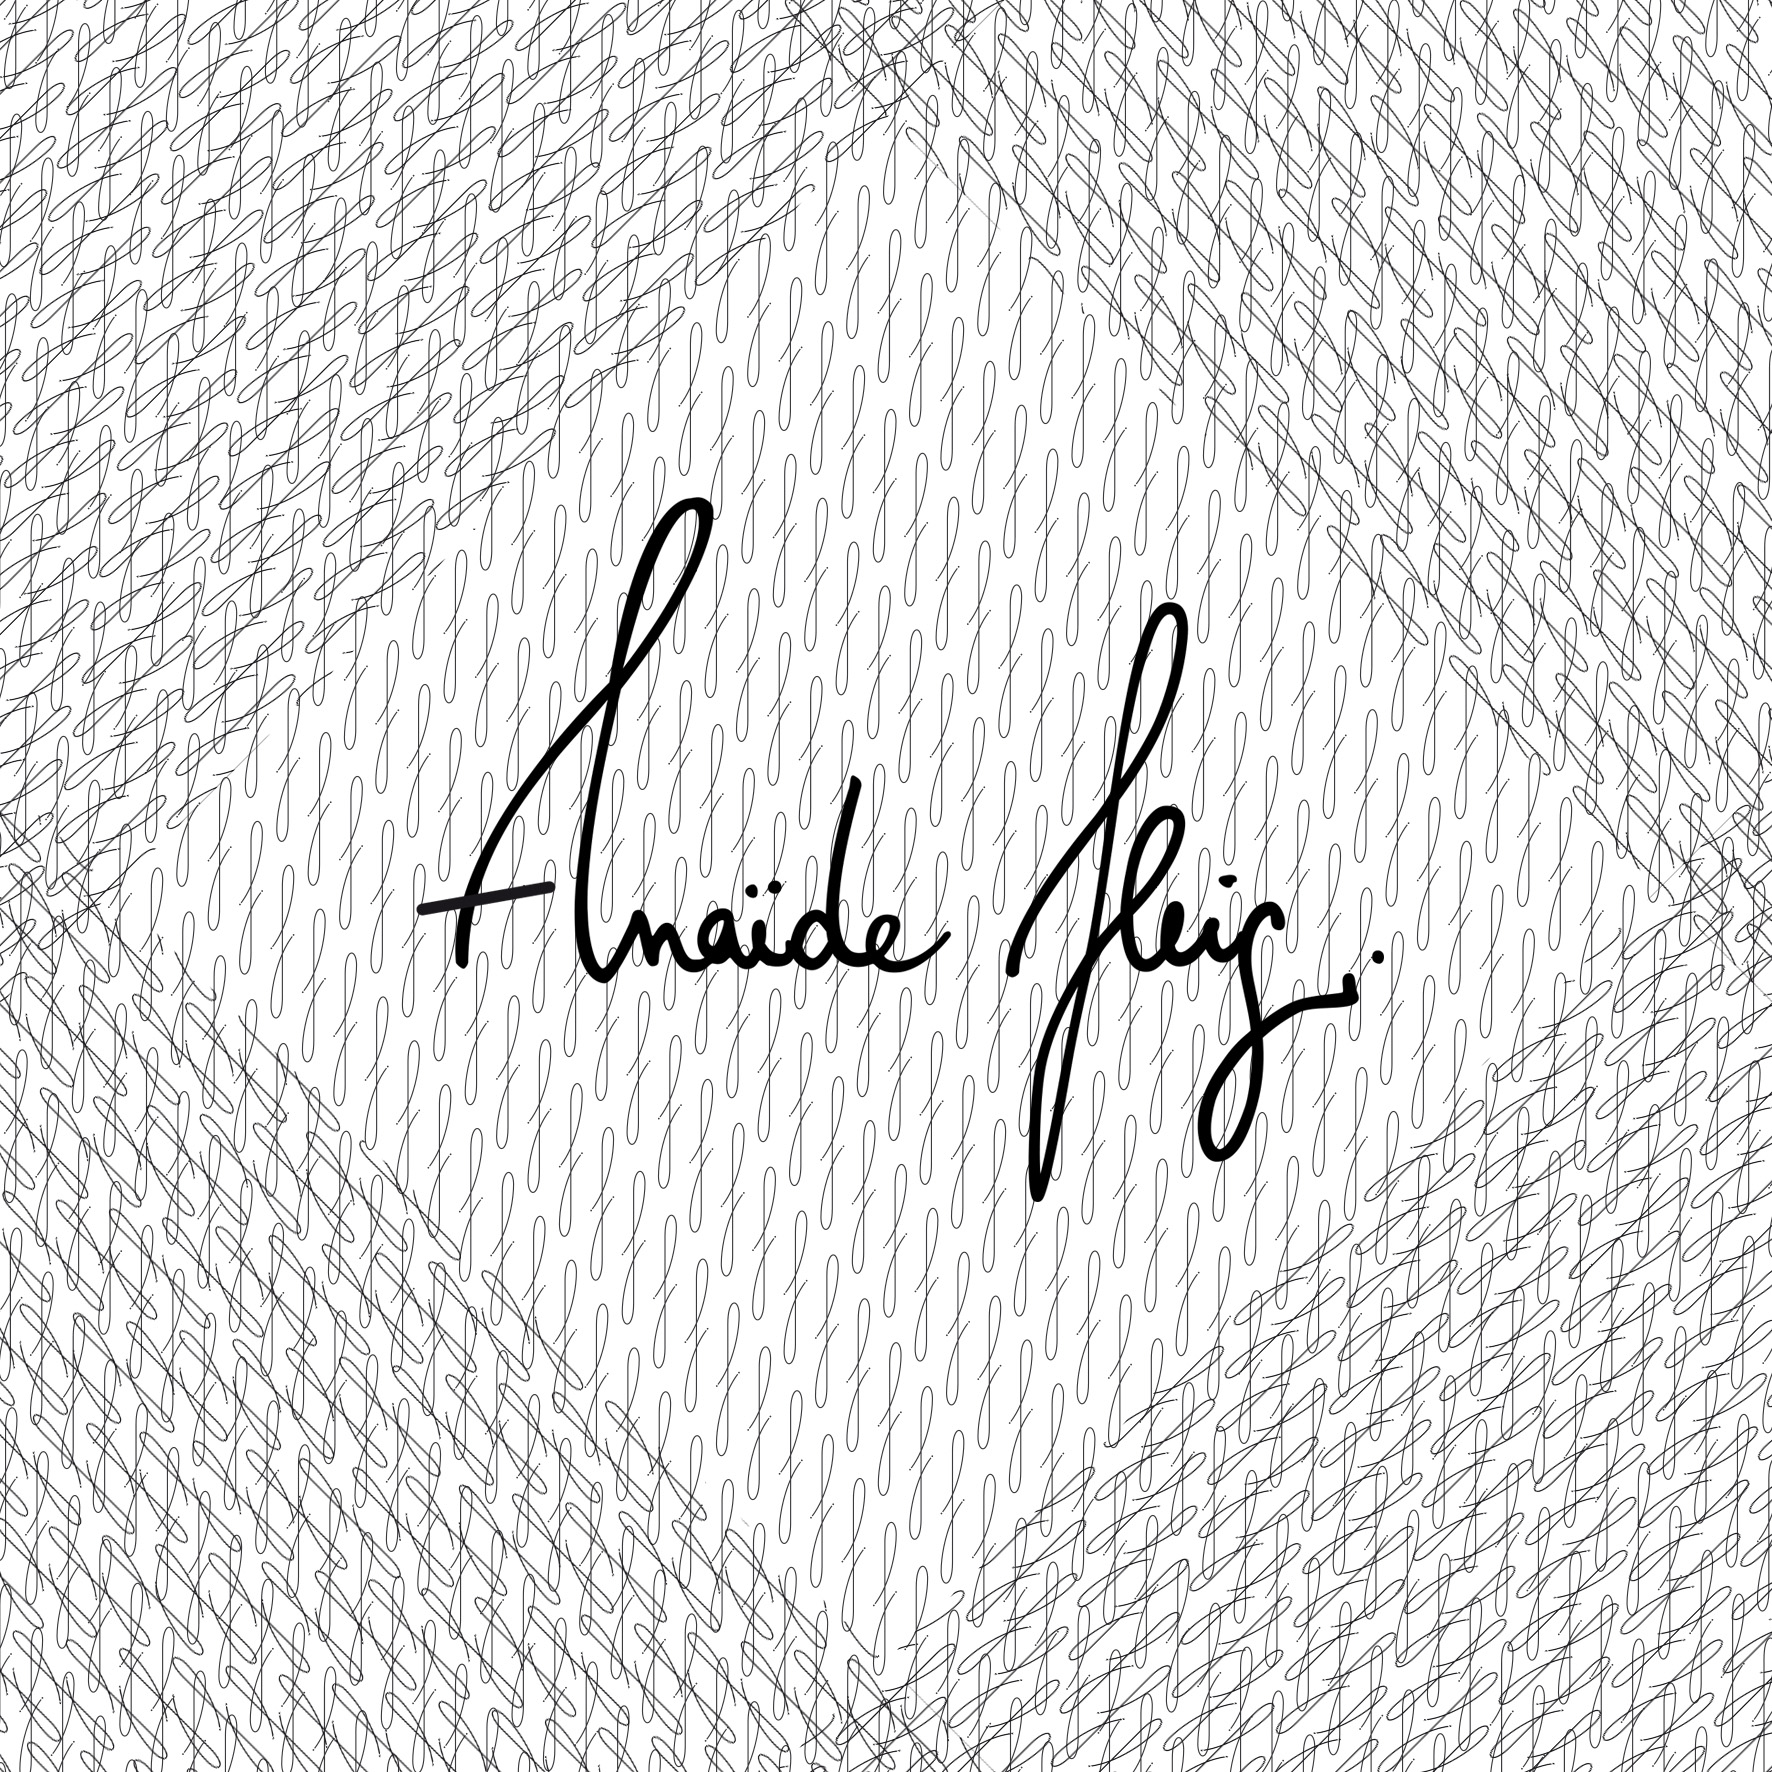 Anaïde Fleig - Amazingly intricate & inspired knot artist